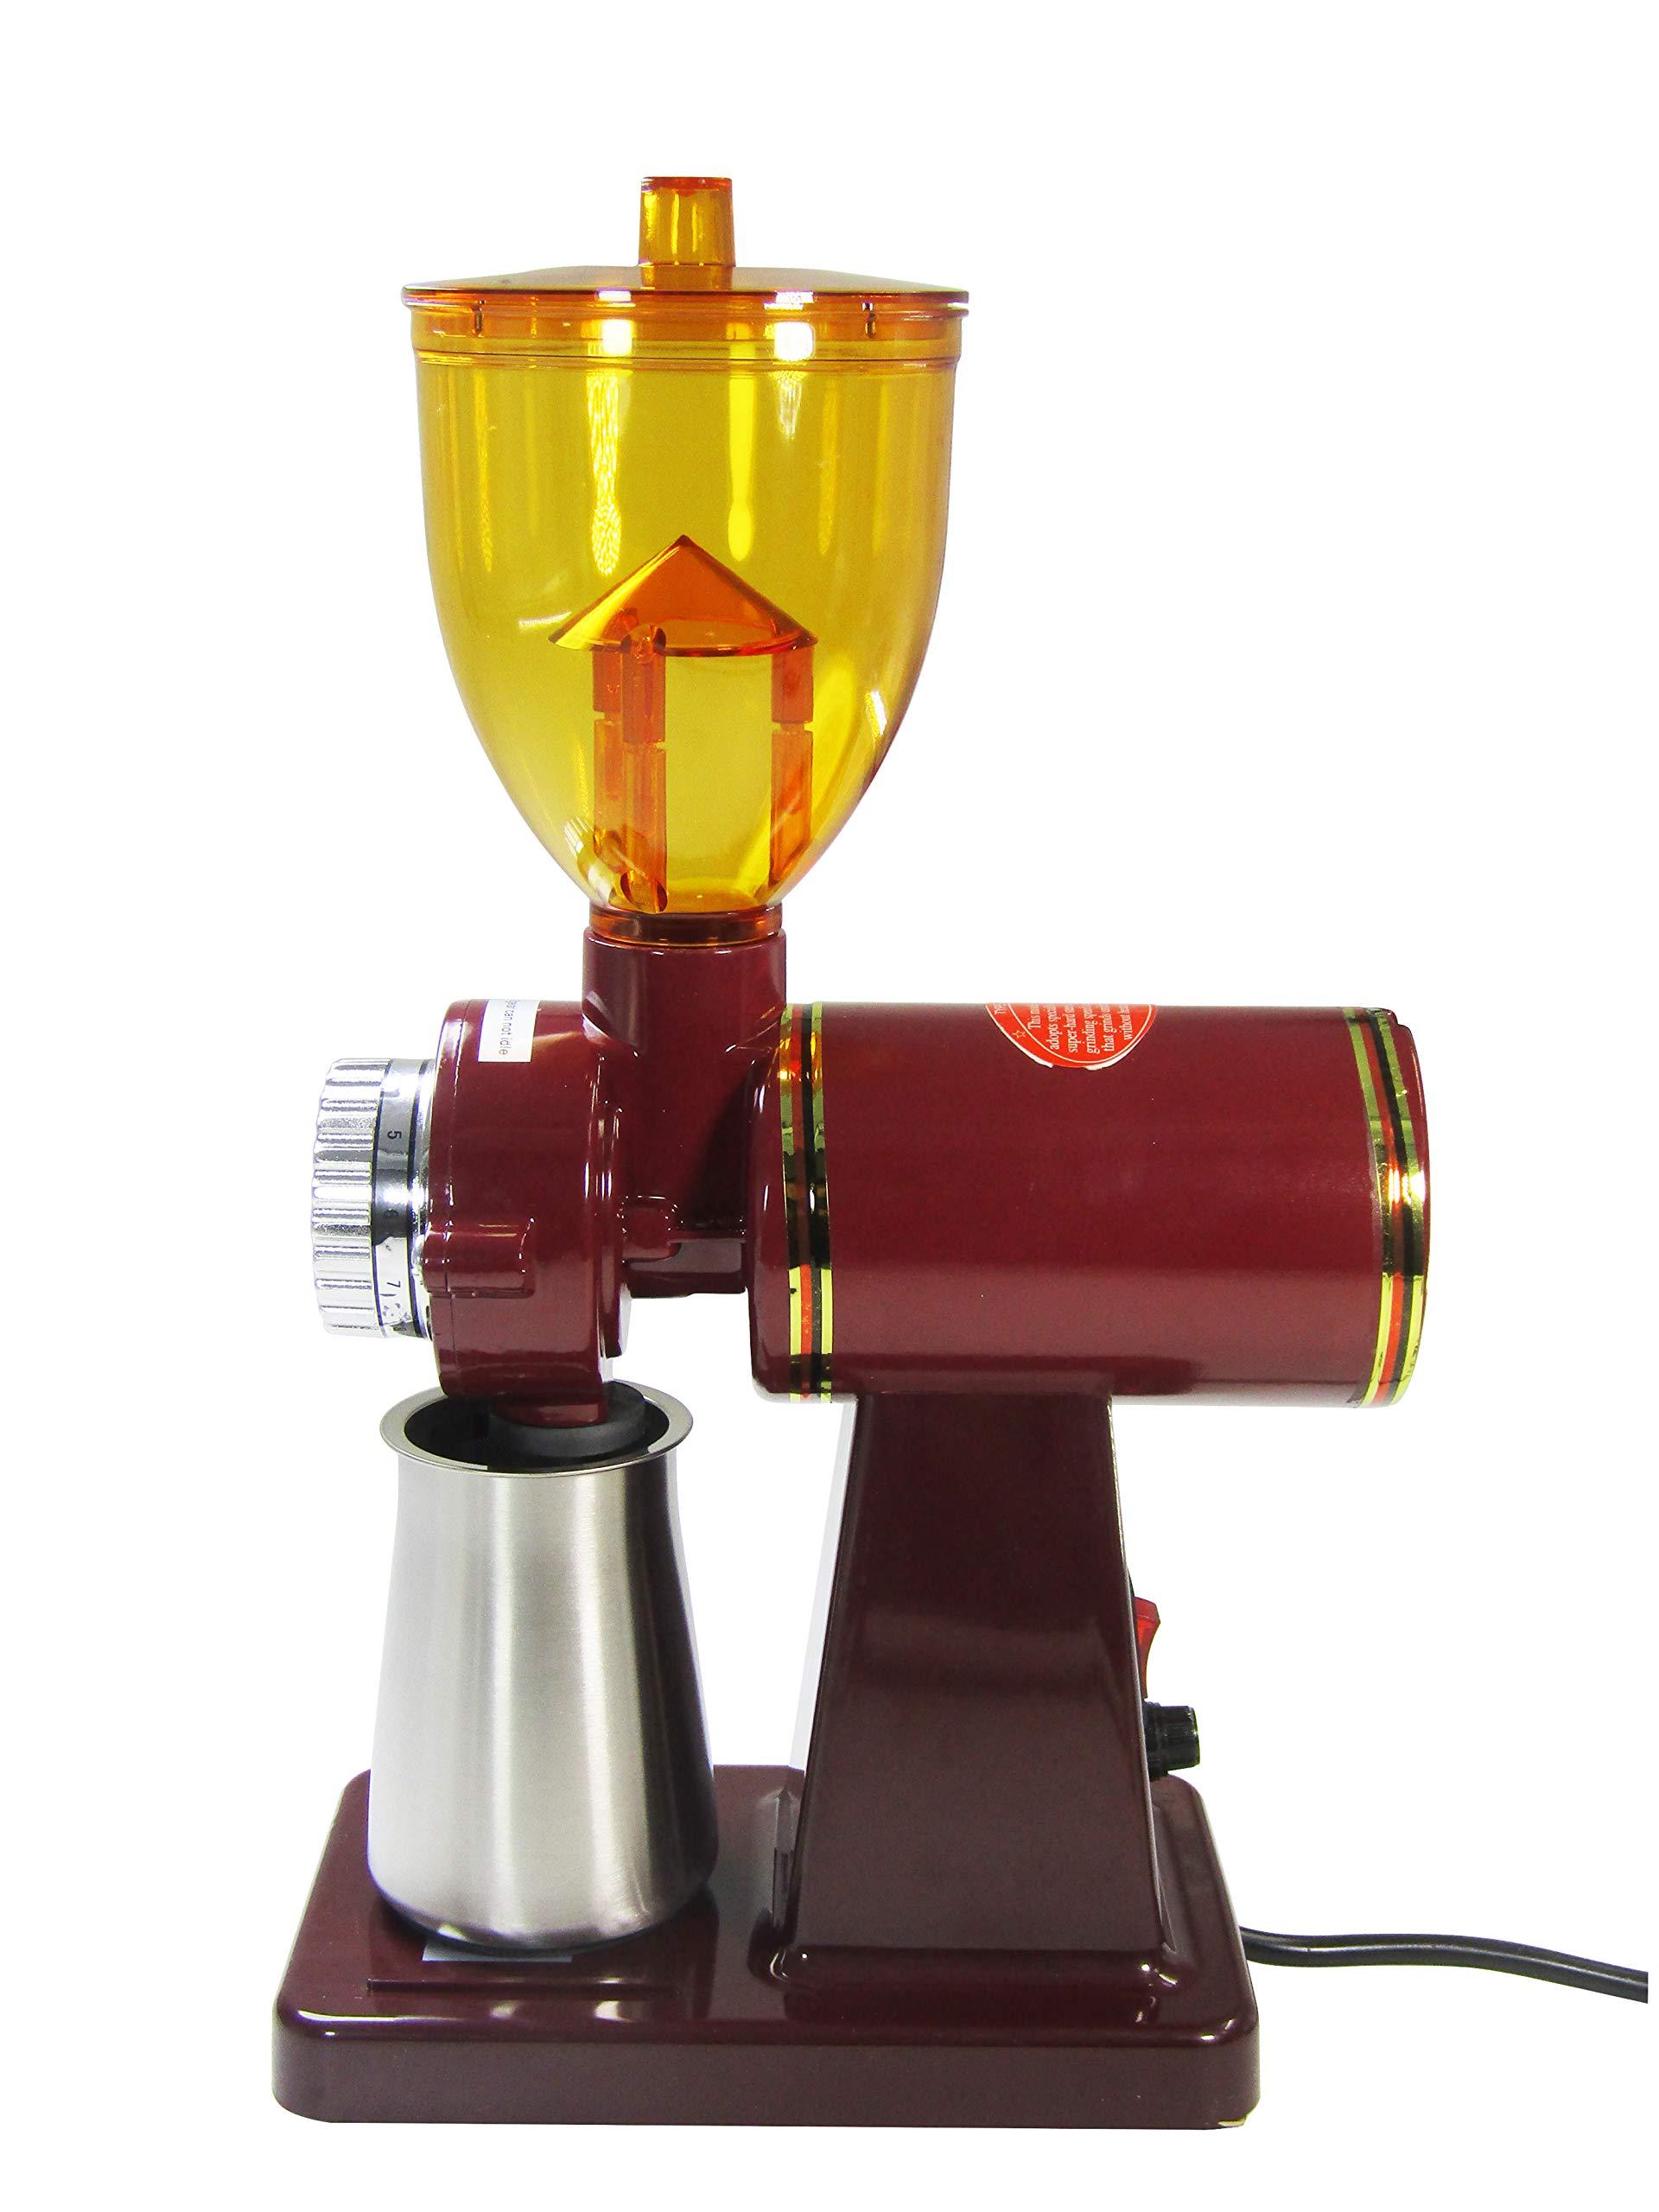 JIAWANSHUN 250g Automatic Coffee Burr Grinder Coffee Burr Mill Coffee Bean Grinder (110V, Red)